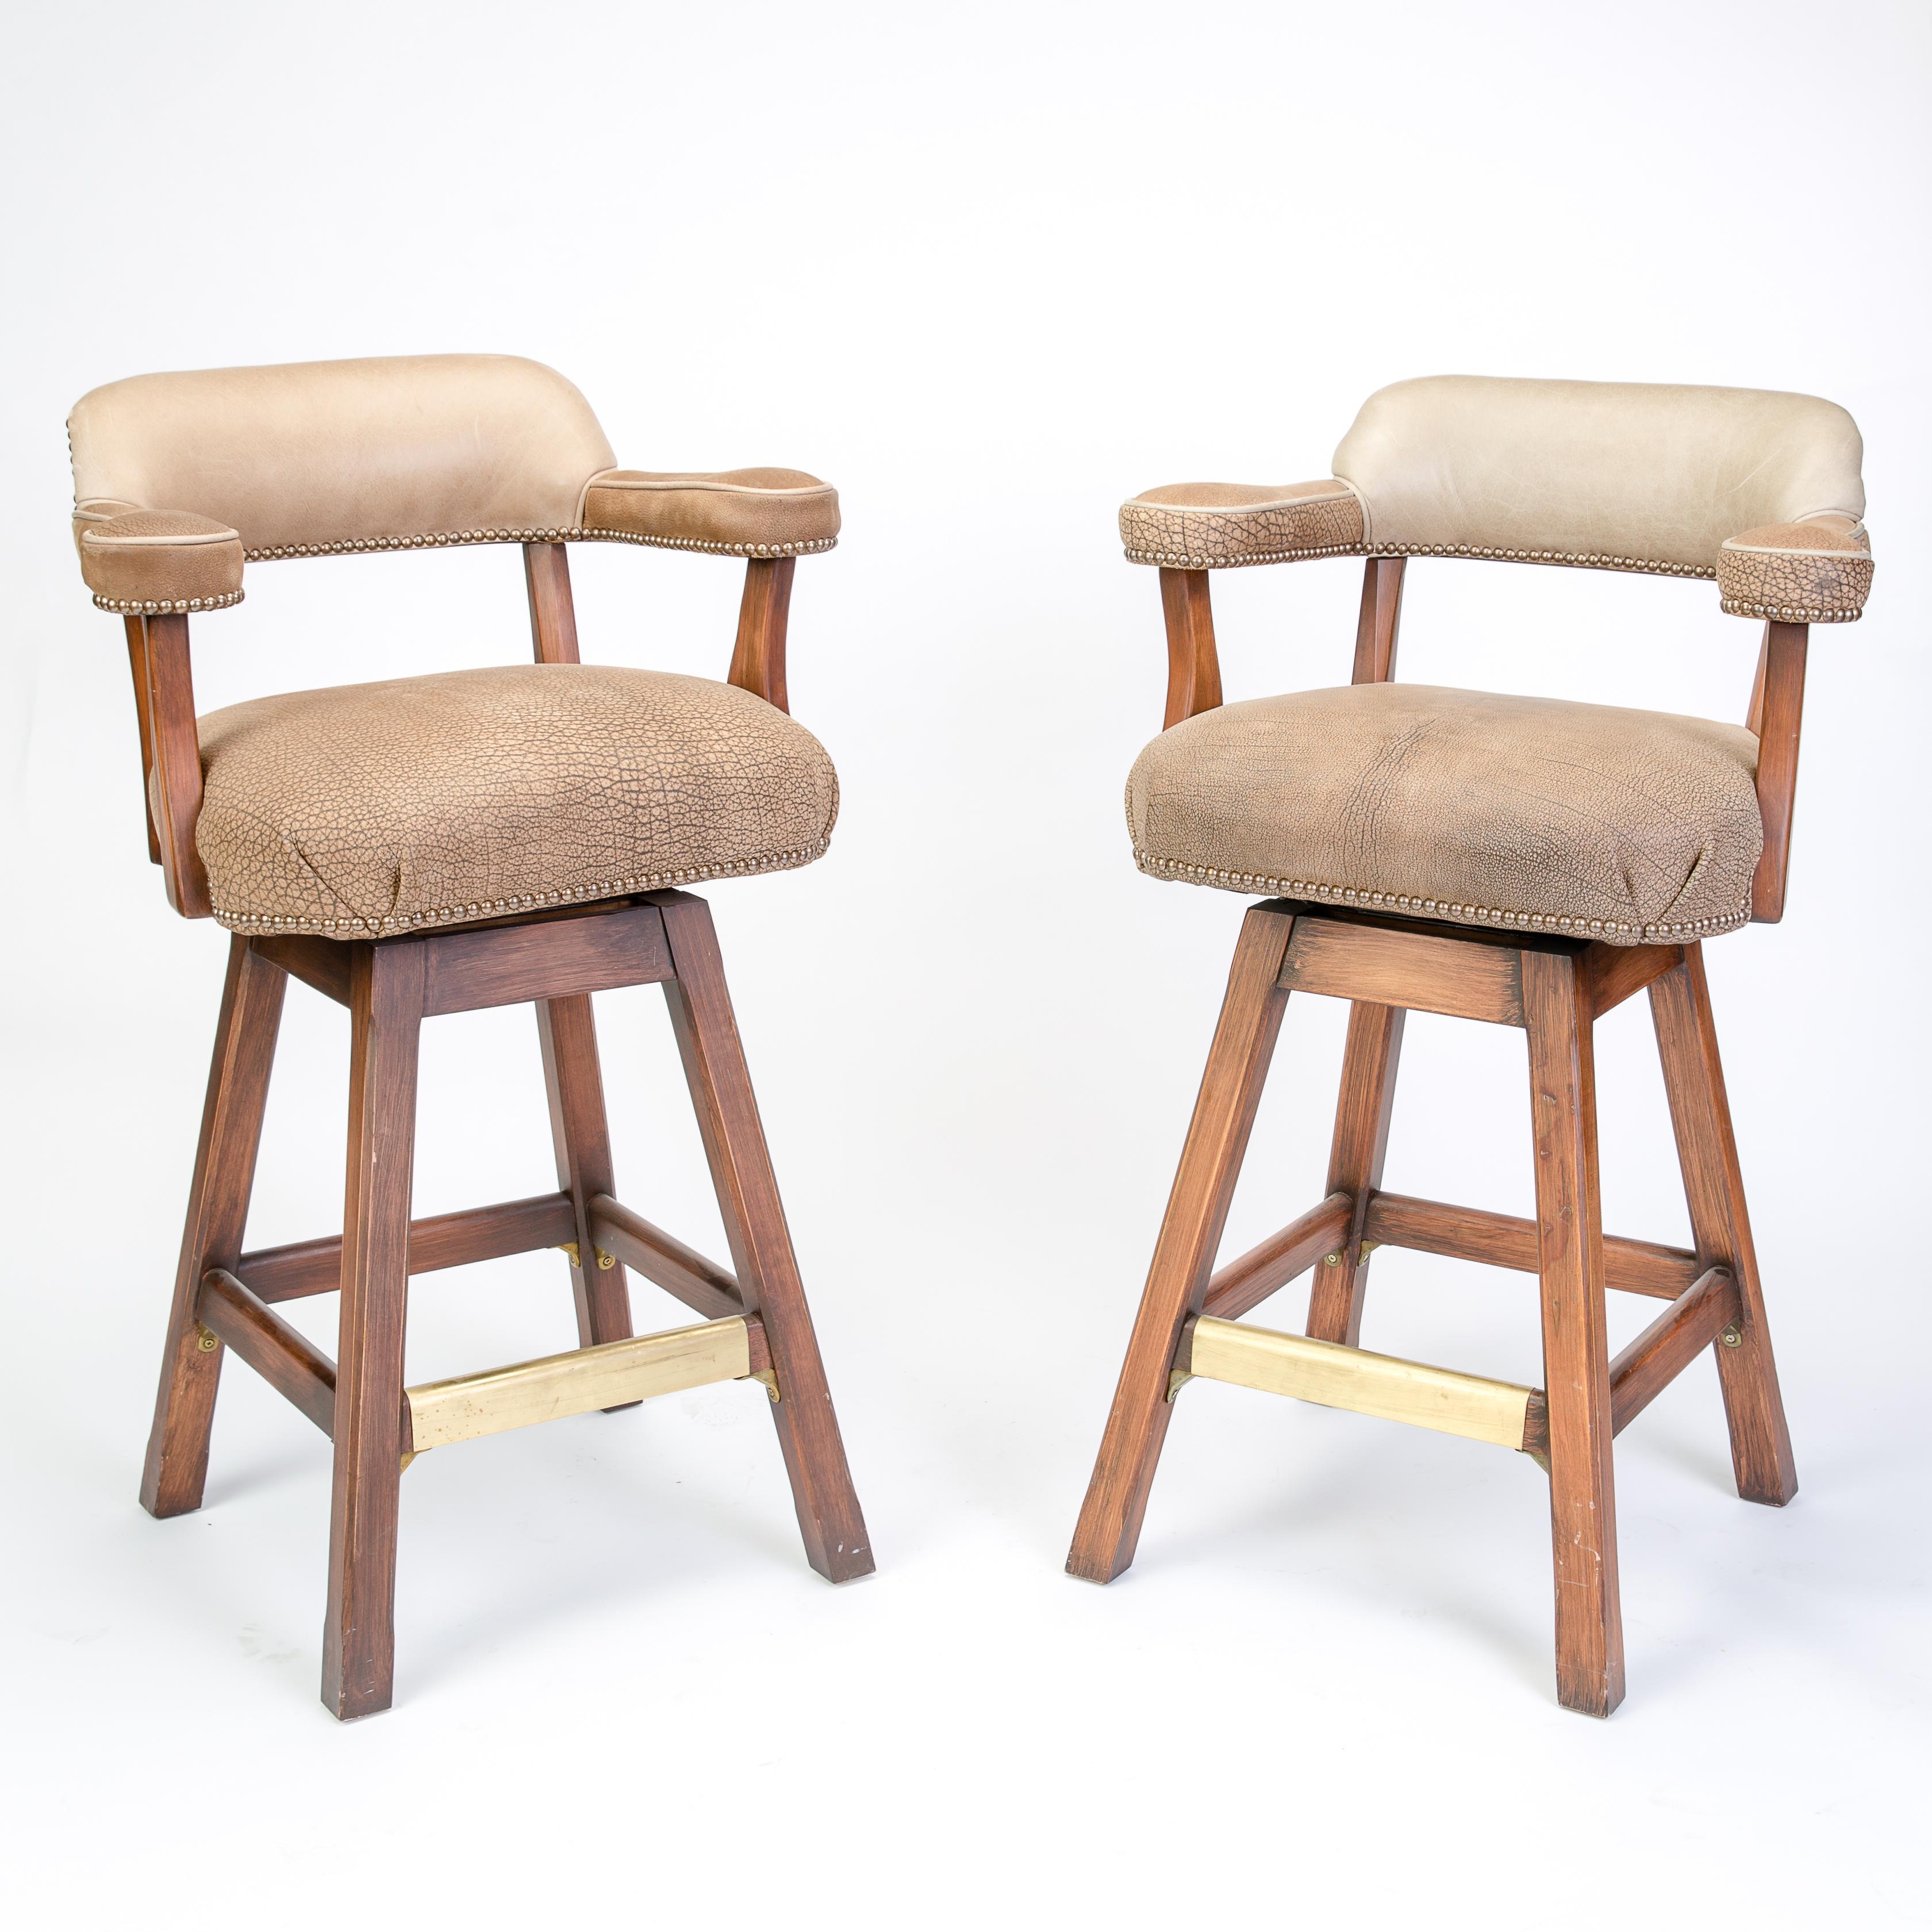 Textured Barrel Back Bar Stools A Pair Chairish